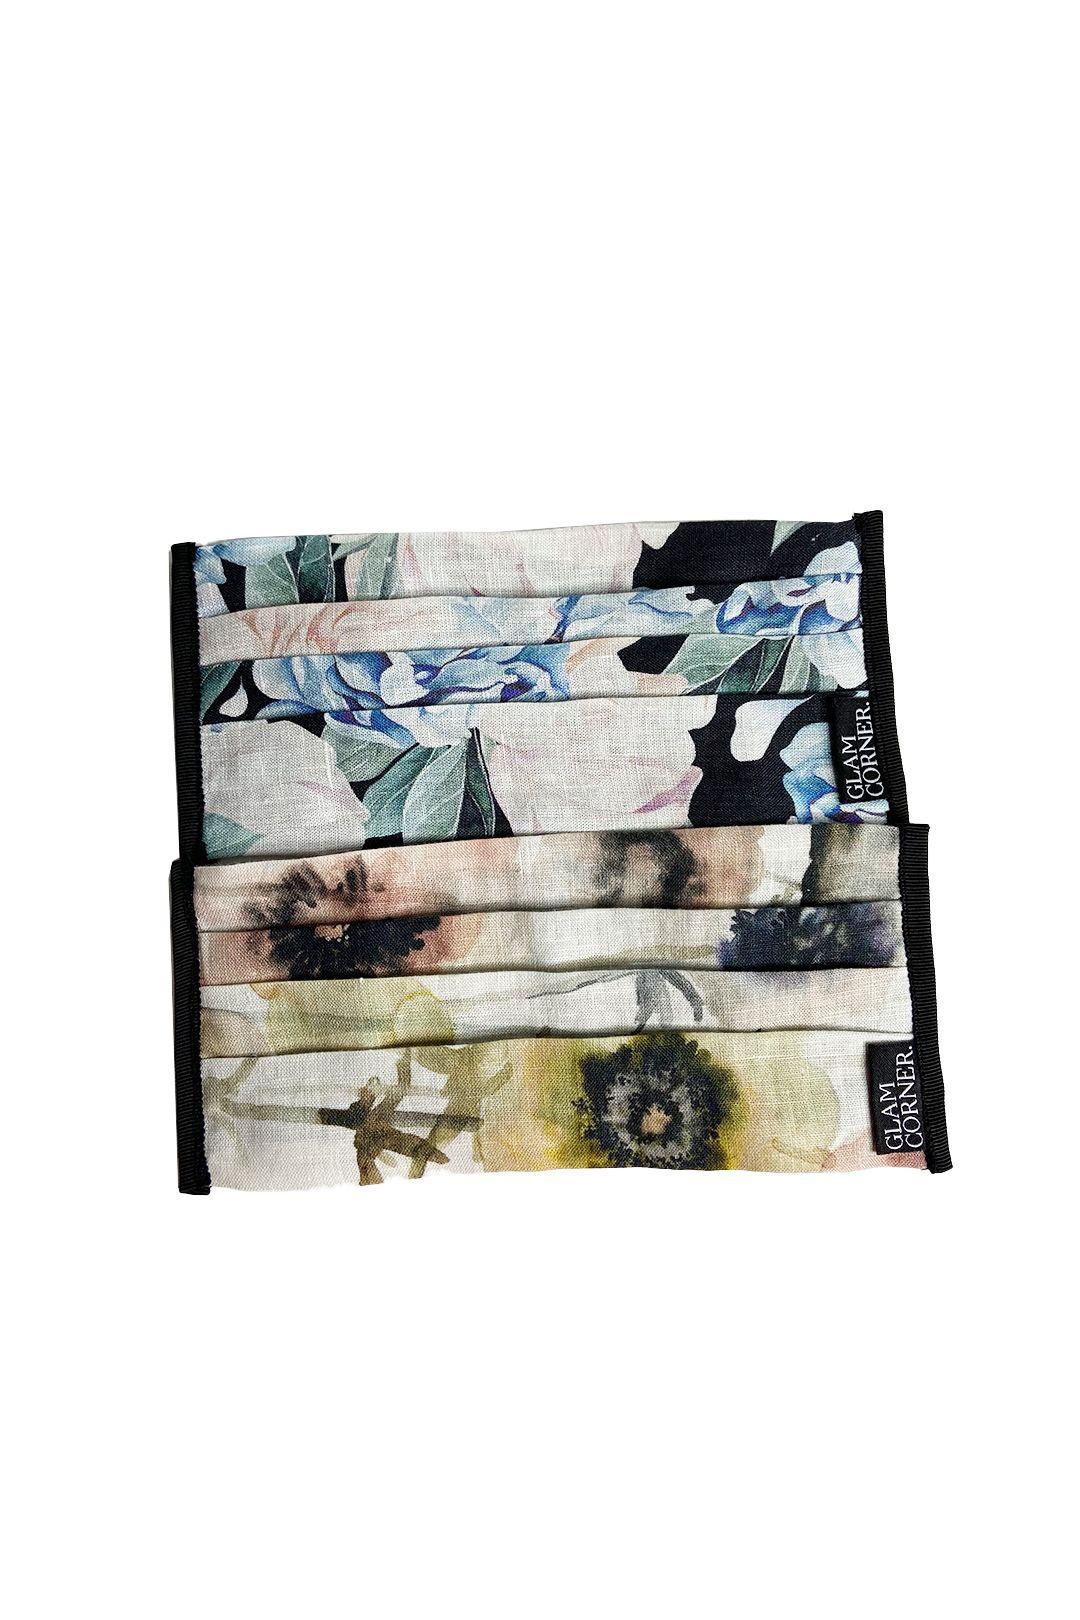 GlamCorner-Three-Layered-Fabric-Face-Masks-2-Pack-Mix-A